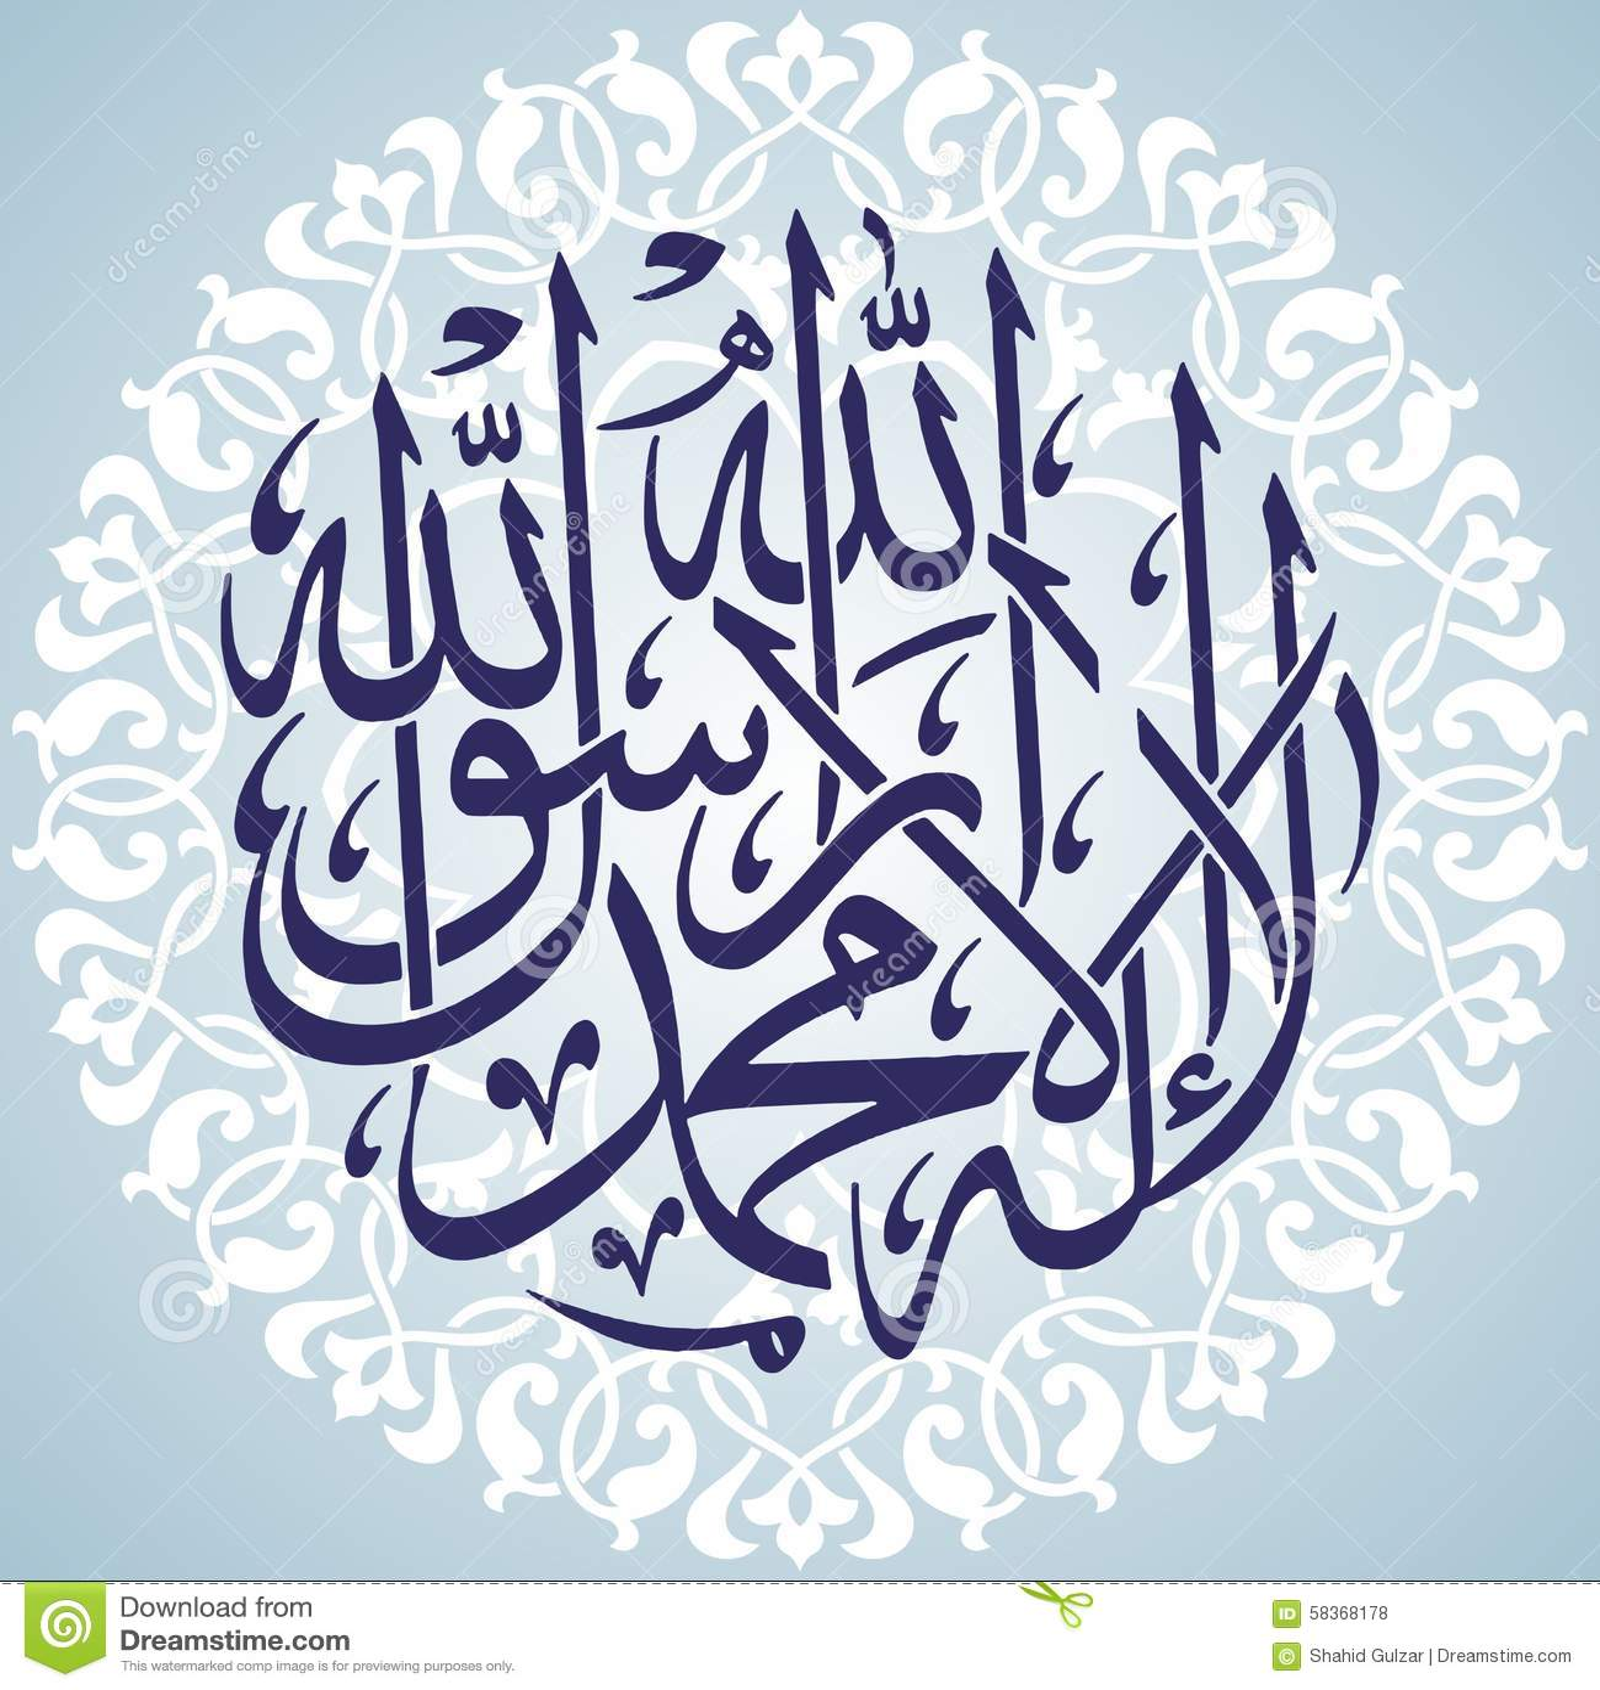 Islamicigraphy Wallpaper Poster Kate Naskh Kalma Download Preview